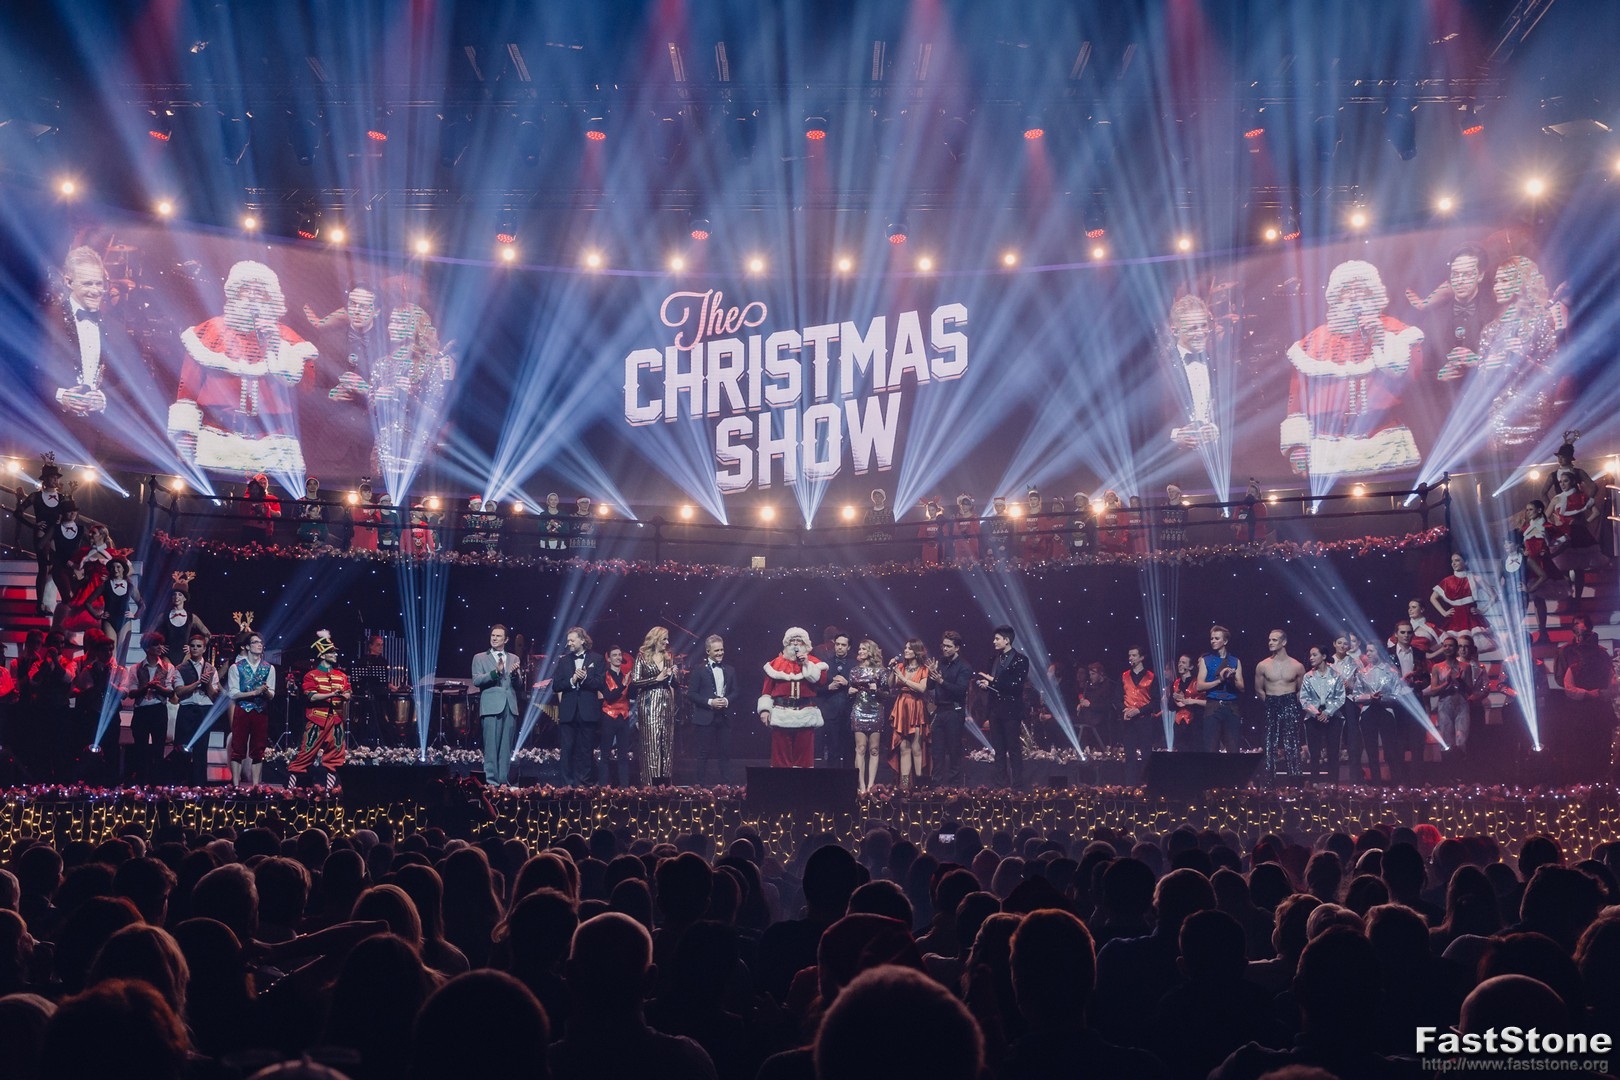 2de Christmas Show was een voltreffer - The Christmas Show 2019